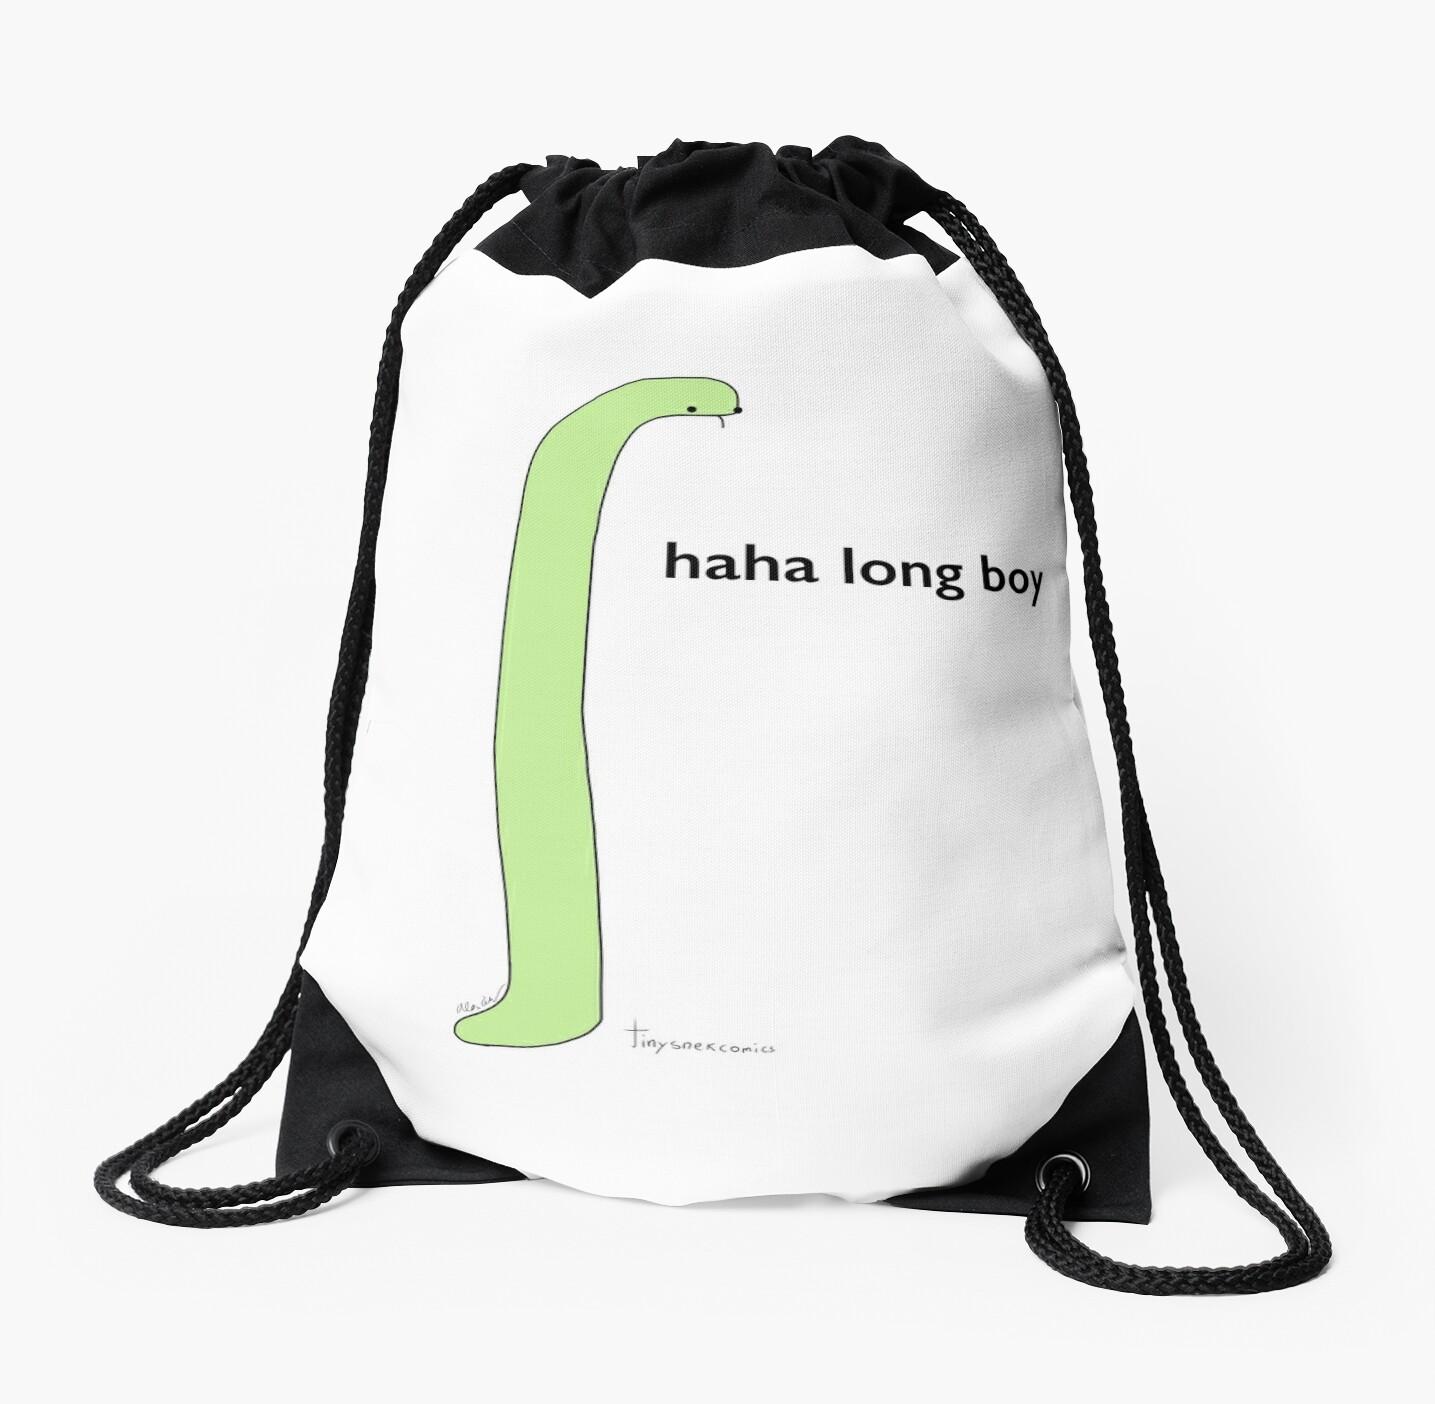 hahal long boy